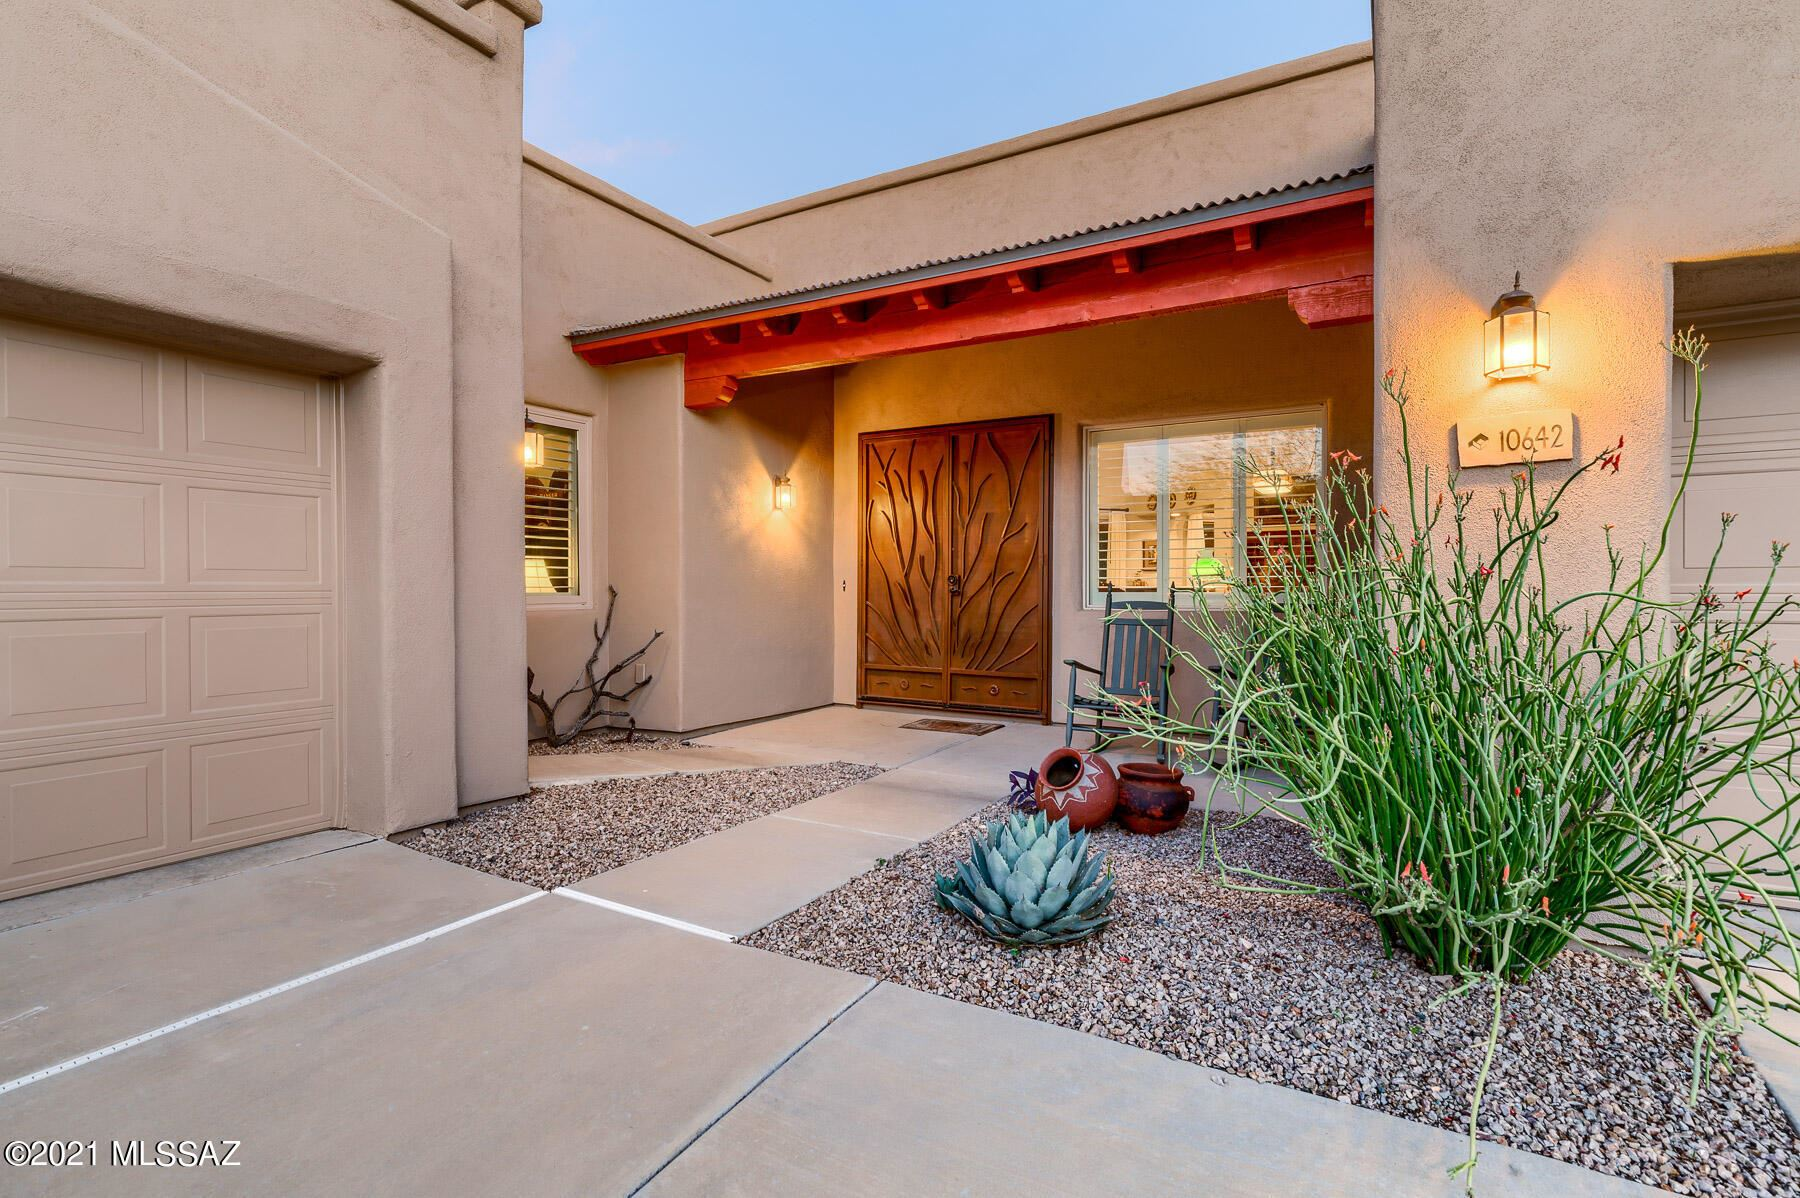 10642 E Mary Stephey Place, Tucson, AZ 85747 - MLS#: 22119678